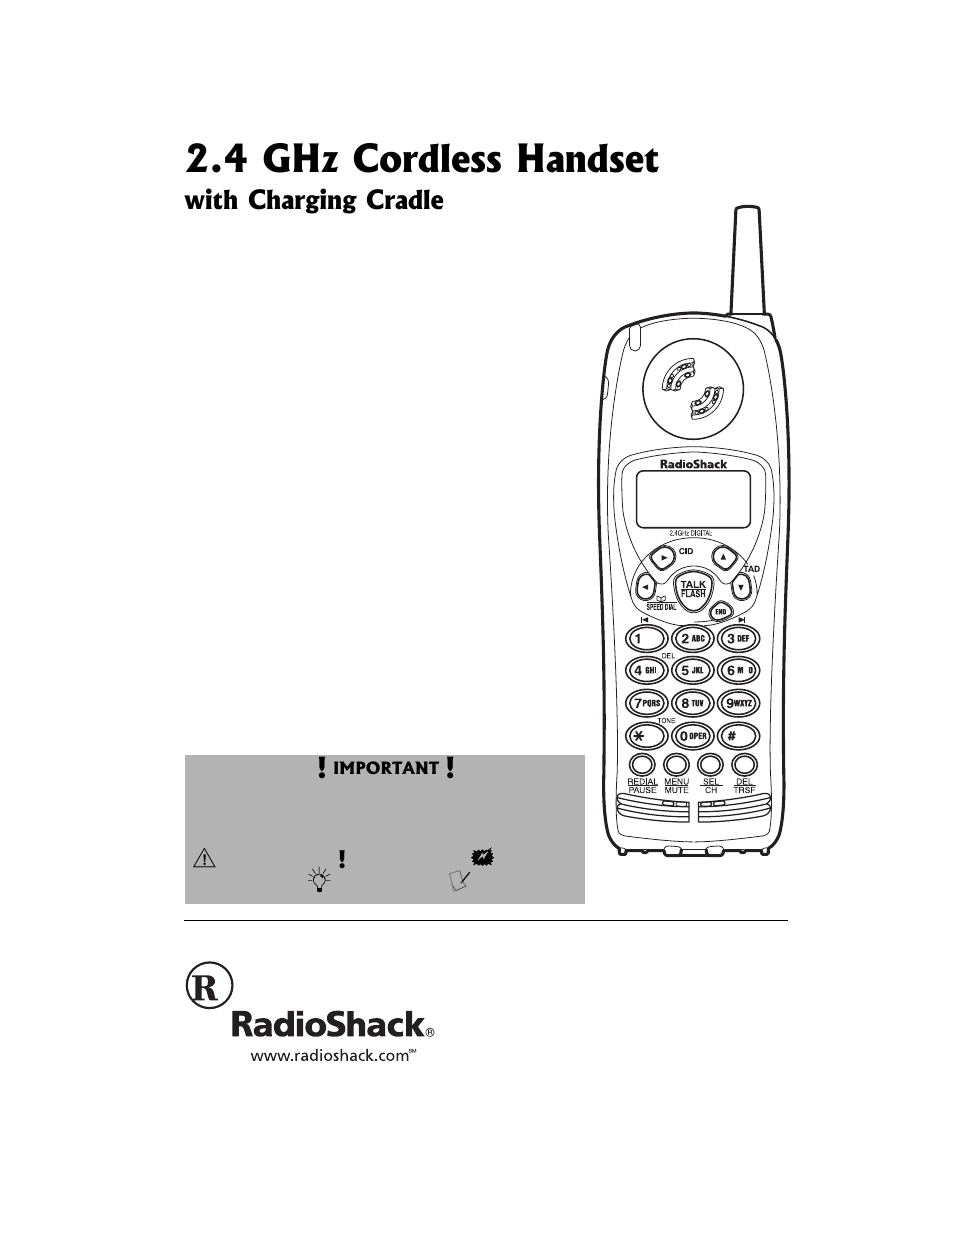 radio shack 2 4 ghz cordless ahndset 43 3538 user manual 8 pages rh manualsdir com Panasonic 2.4Ghz Cordless Phone Radio Shack 2.4 GHz Cordless Phone